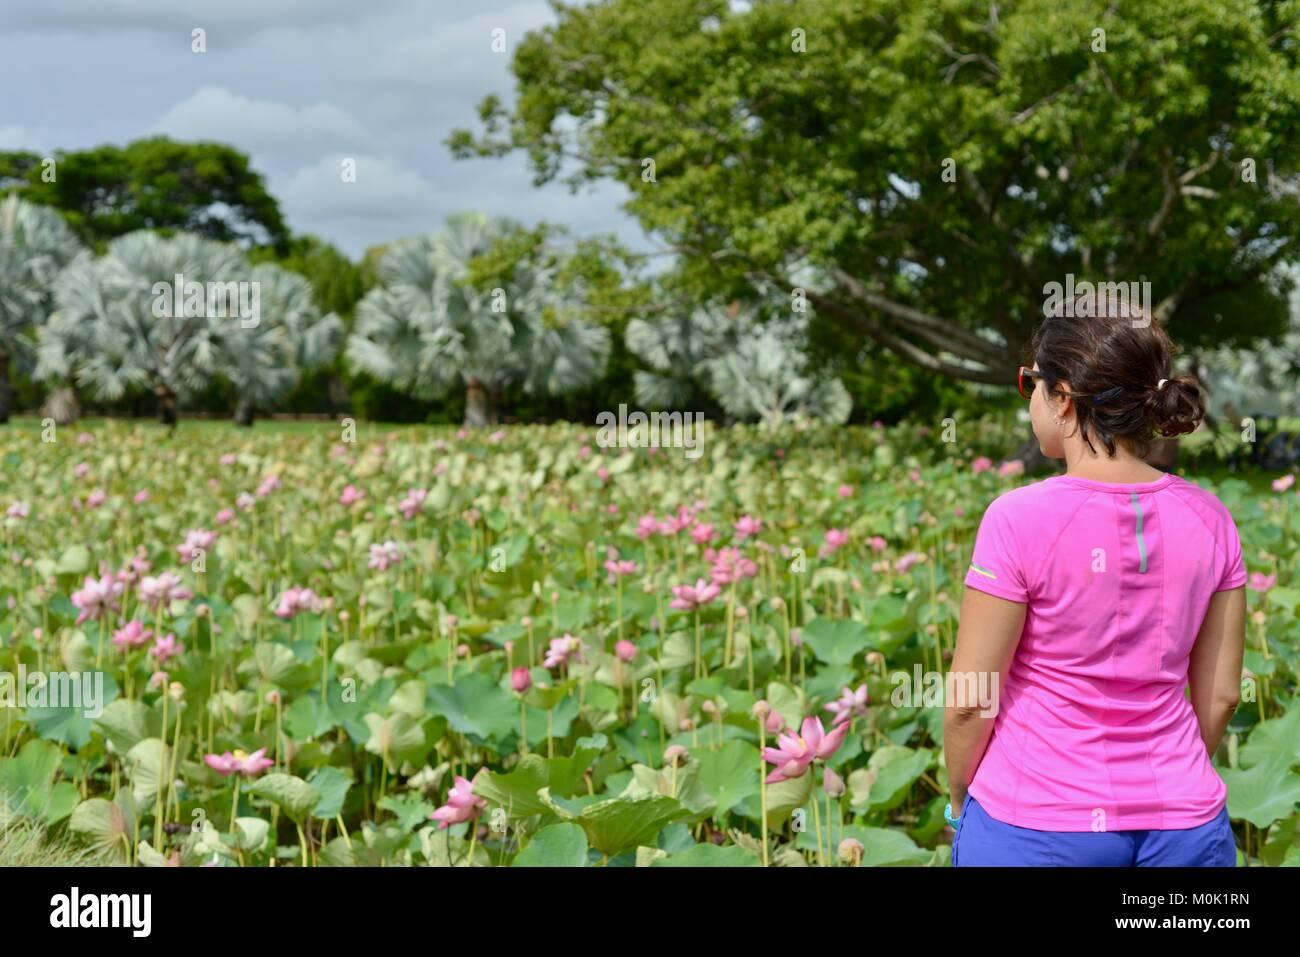 Women with pink sports top enjoying Anderson Park Botanic Gardens, Townsville, Queensland, Australia - Stock Image